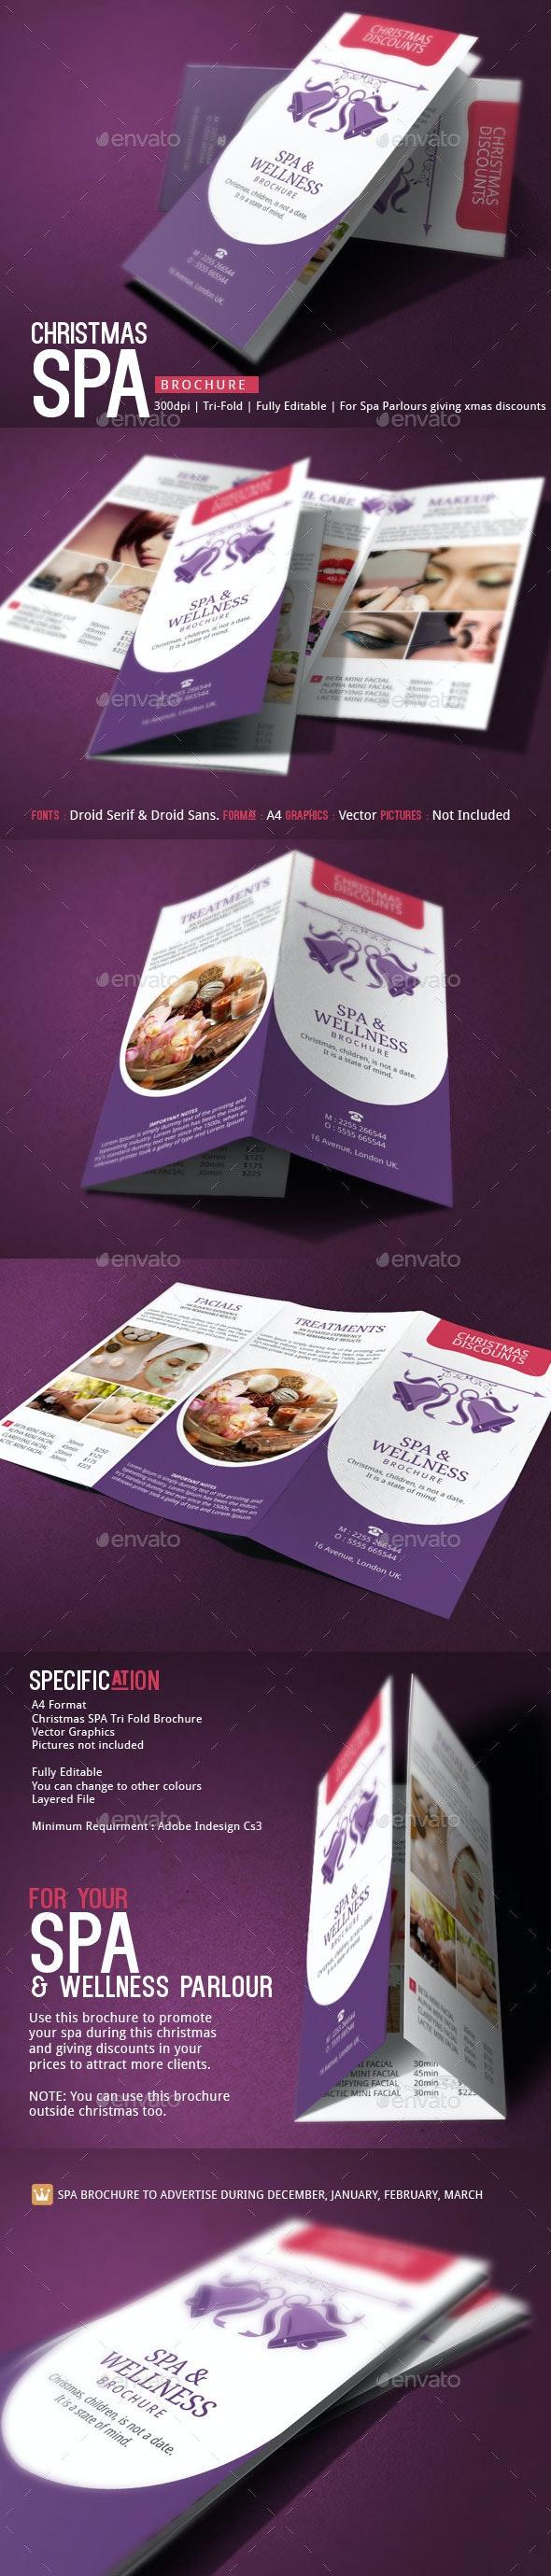 Spa Brochure Template Christmas Deals - Corporate Brochures